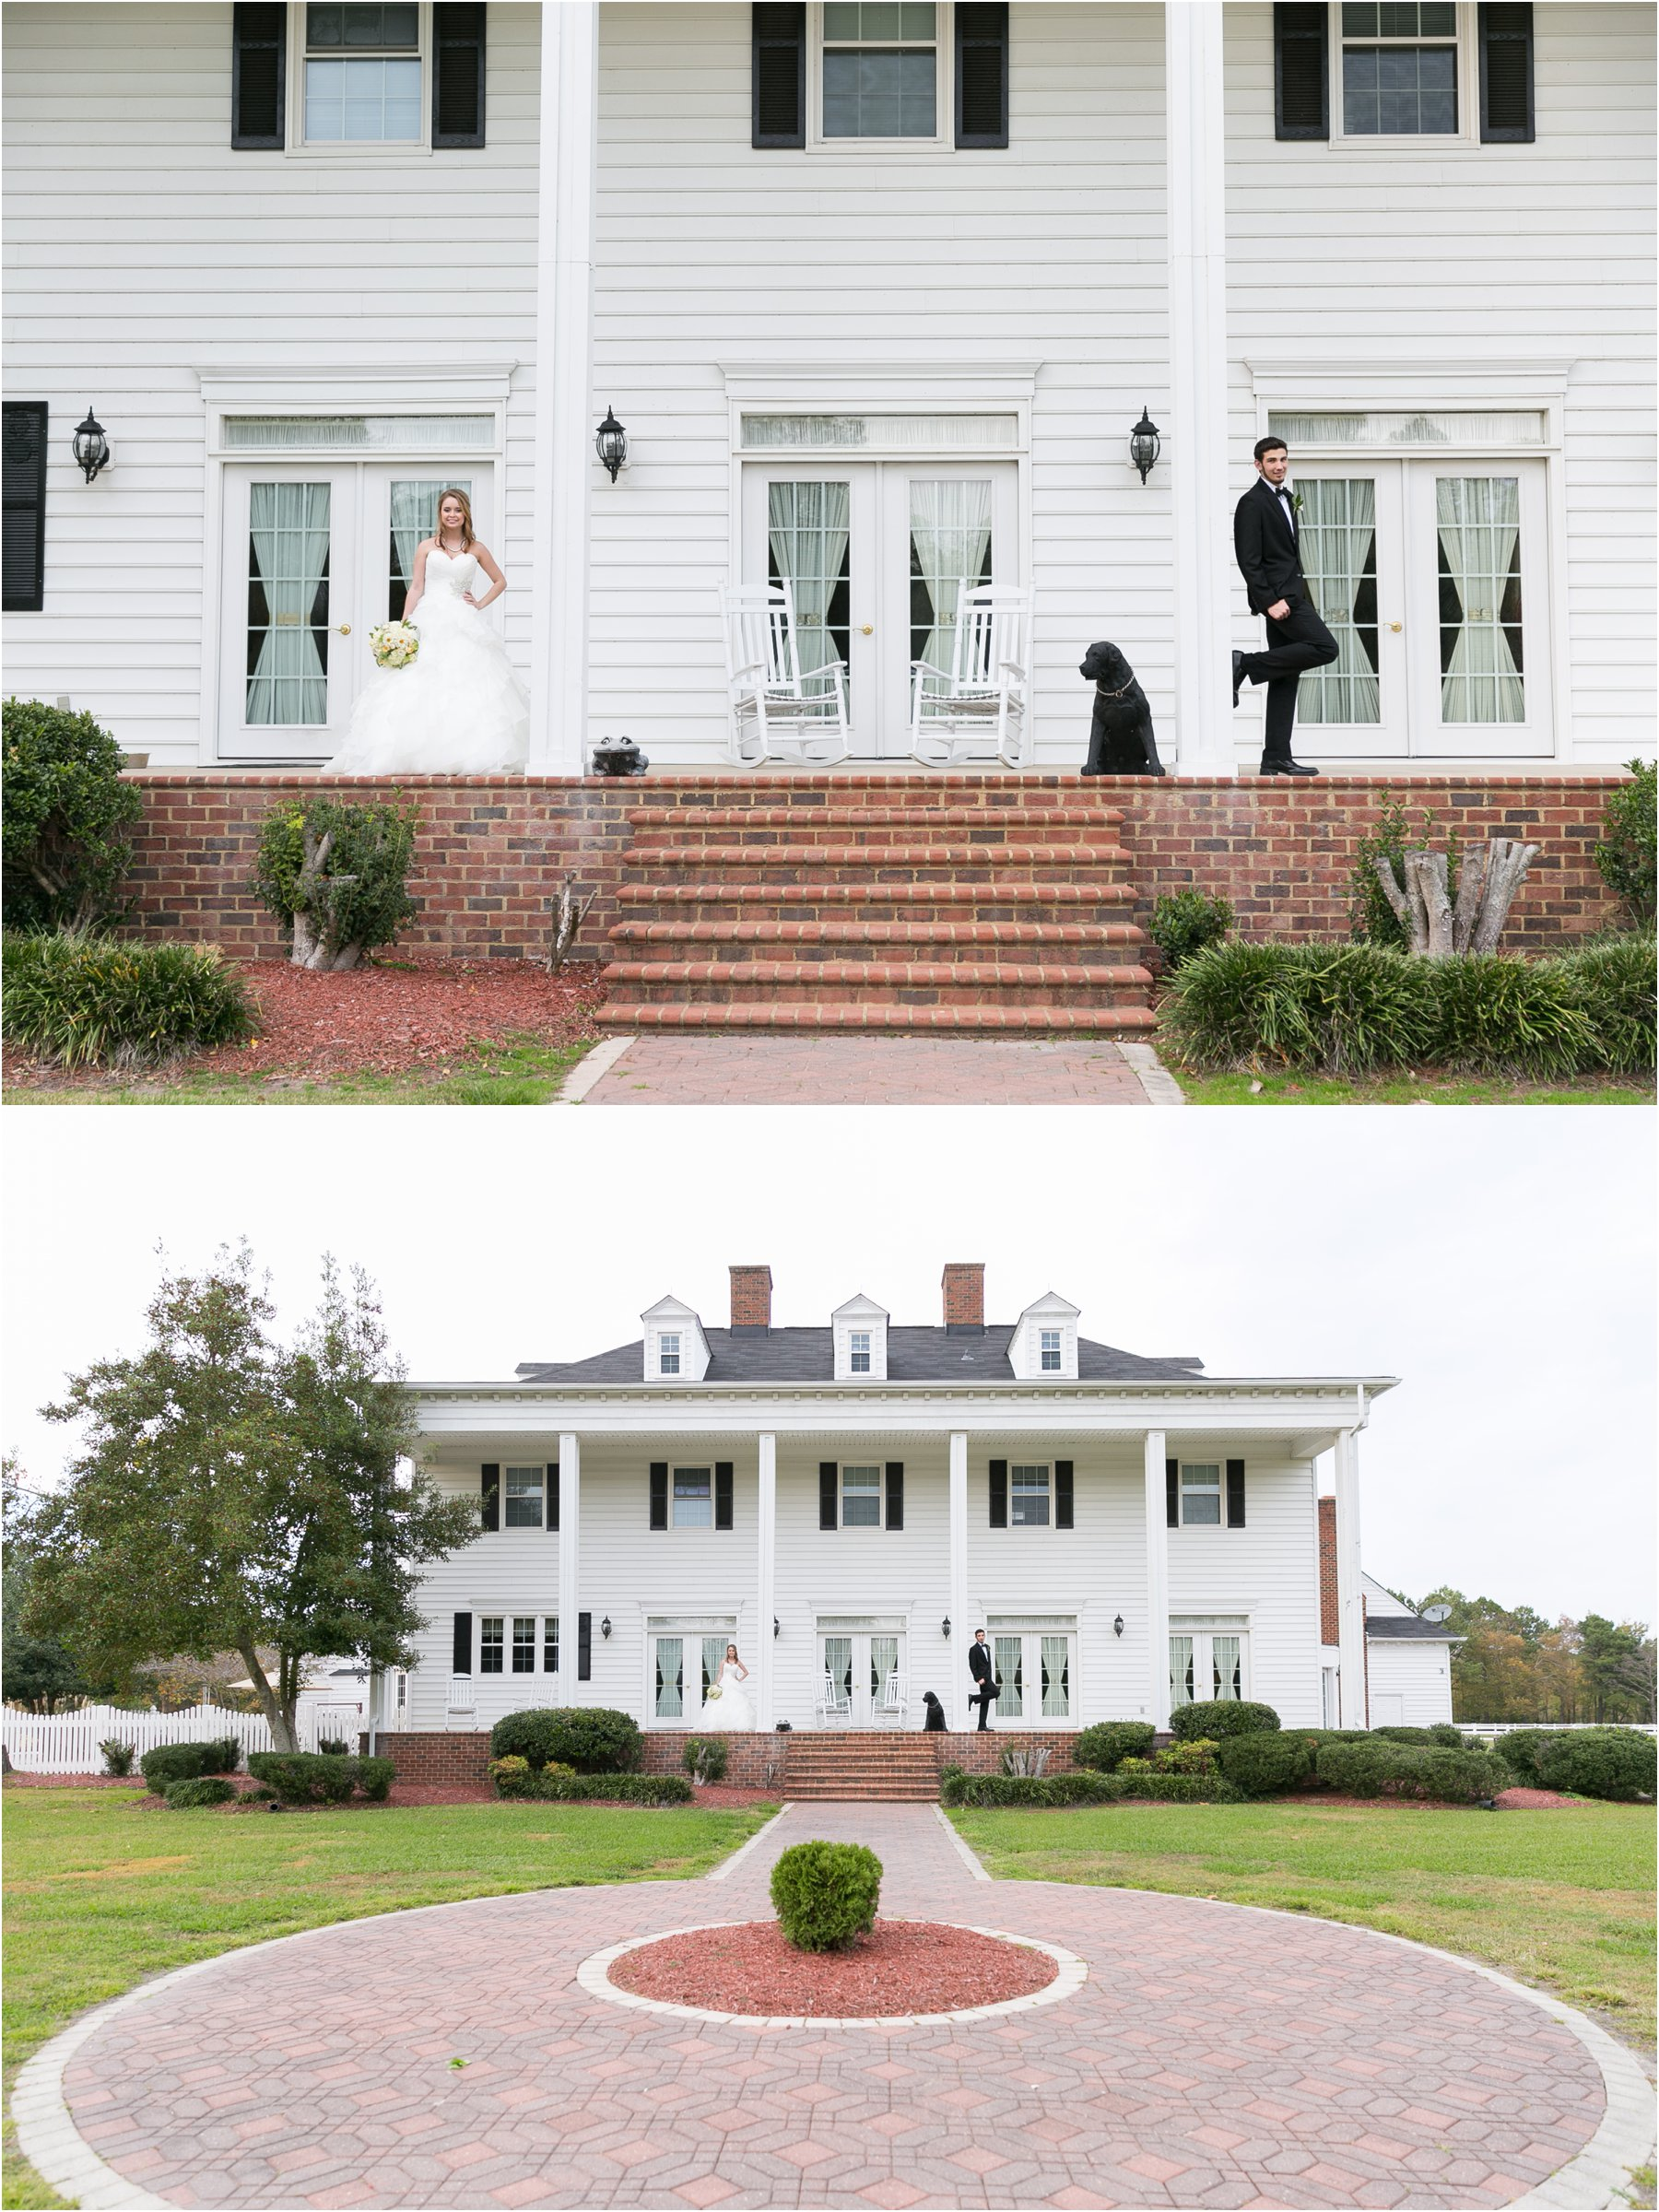 Holly_Ridge_Manor_Wedding_Photography_Jessica_Ryan_Photography_virginia_virginia_beach_0259